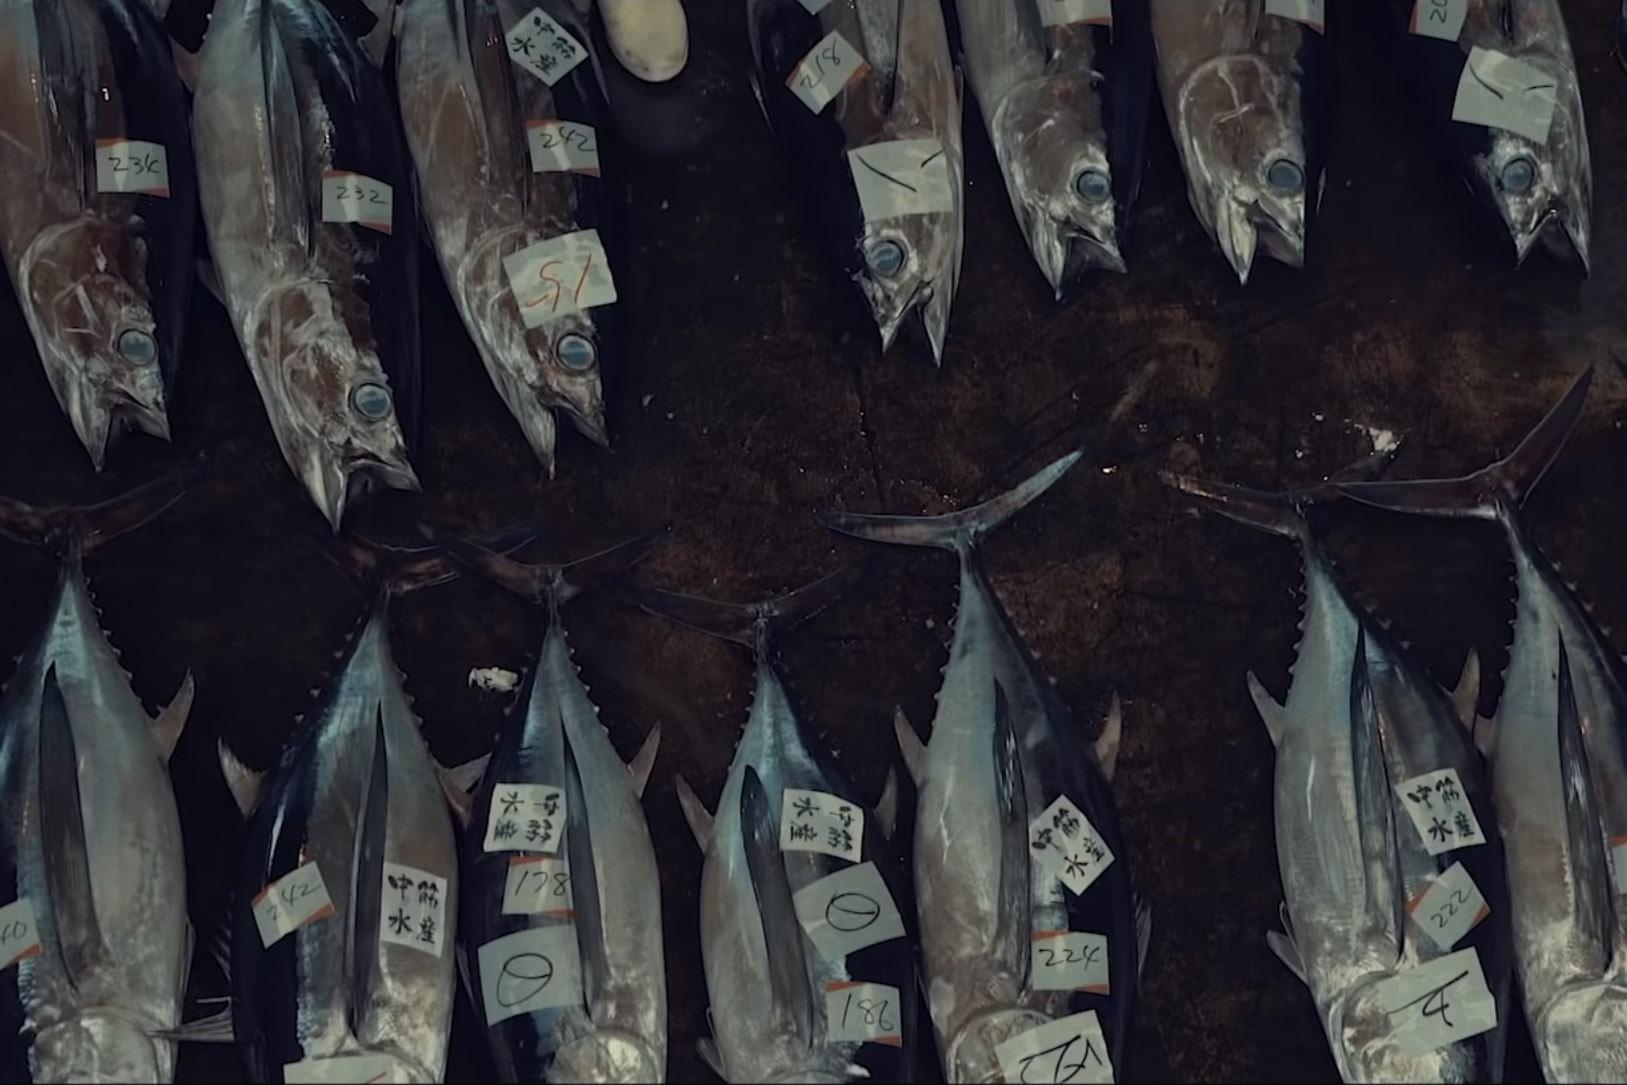 Netflix-Doku Seaspiracy: Wie der Mensch die Meere zerstört